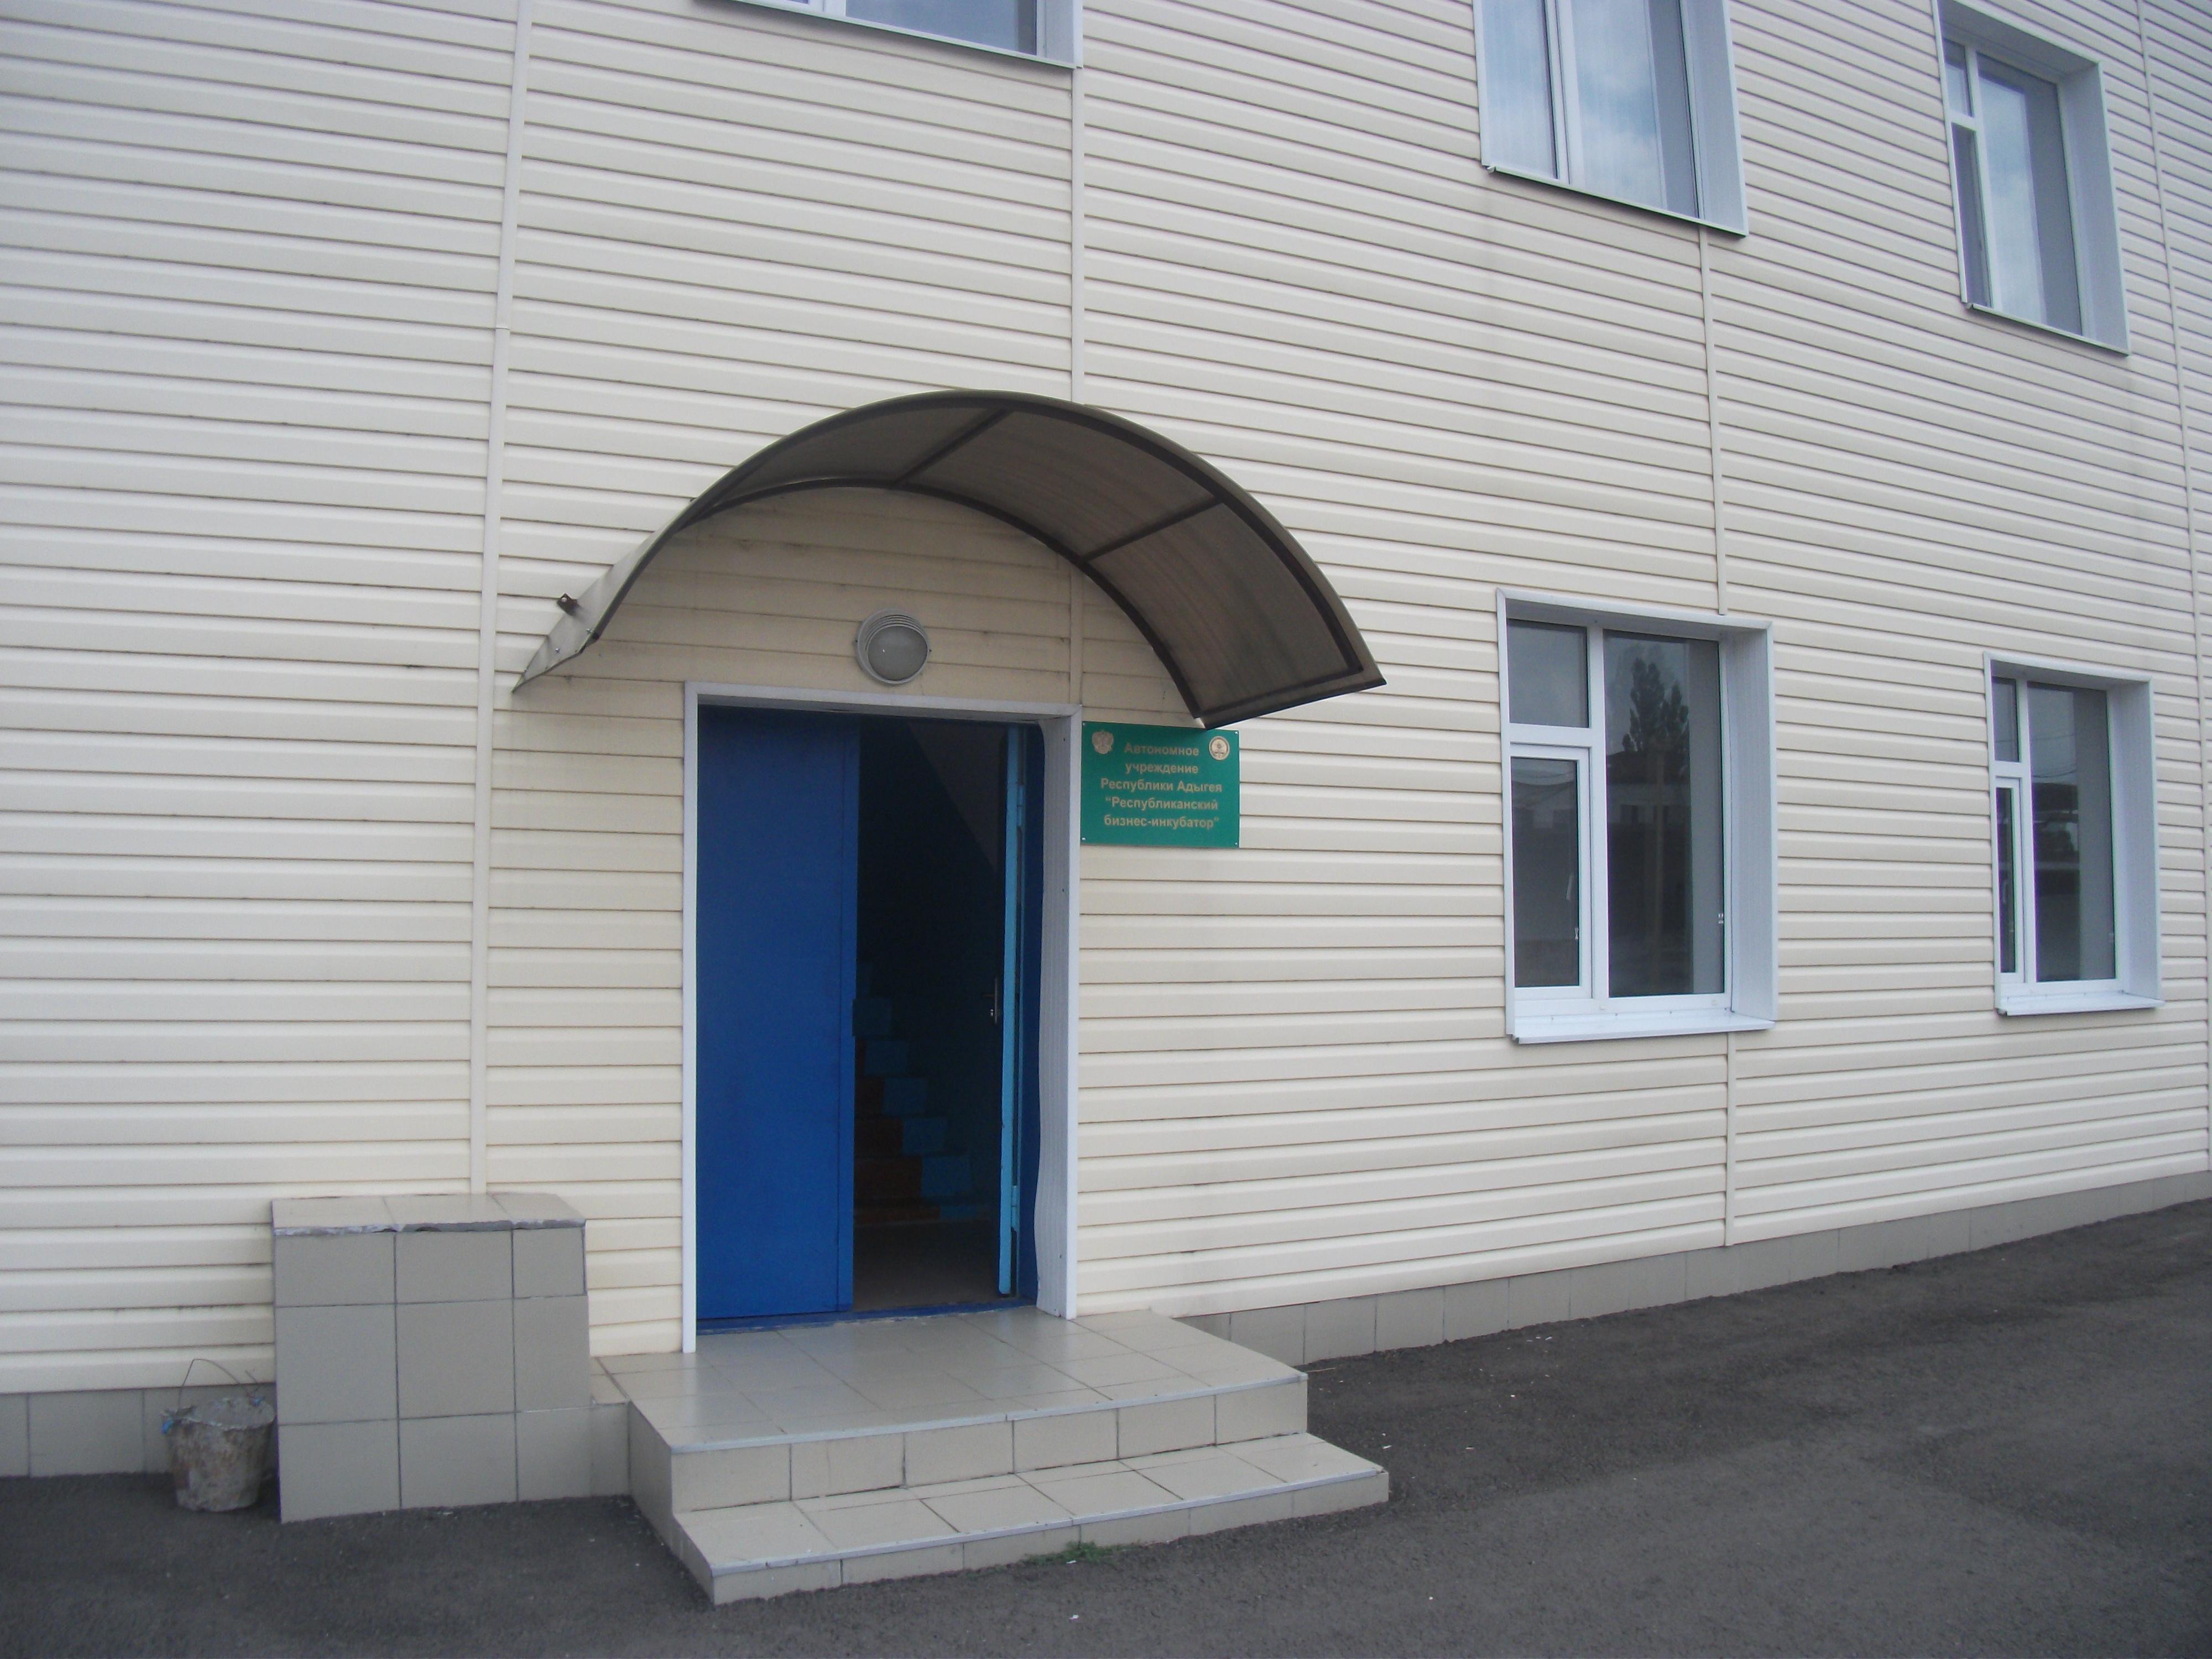 Здание офиса Бизнес Инкубатора